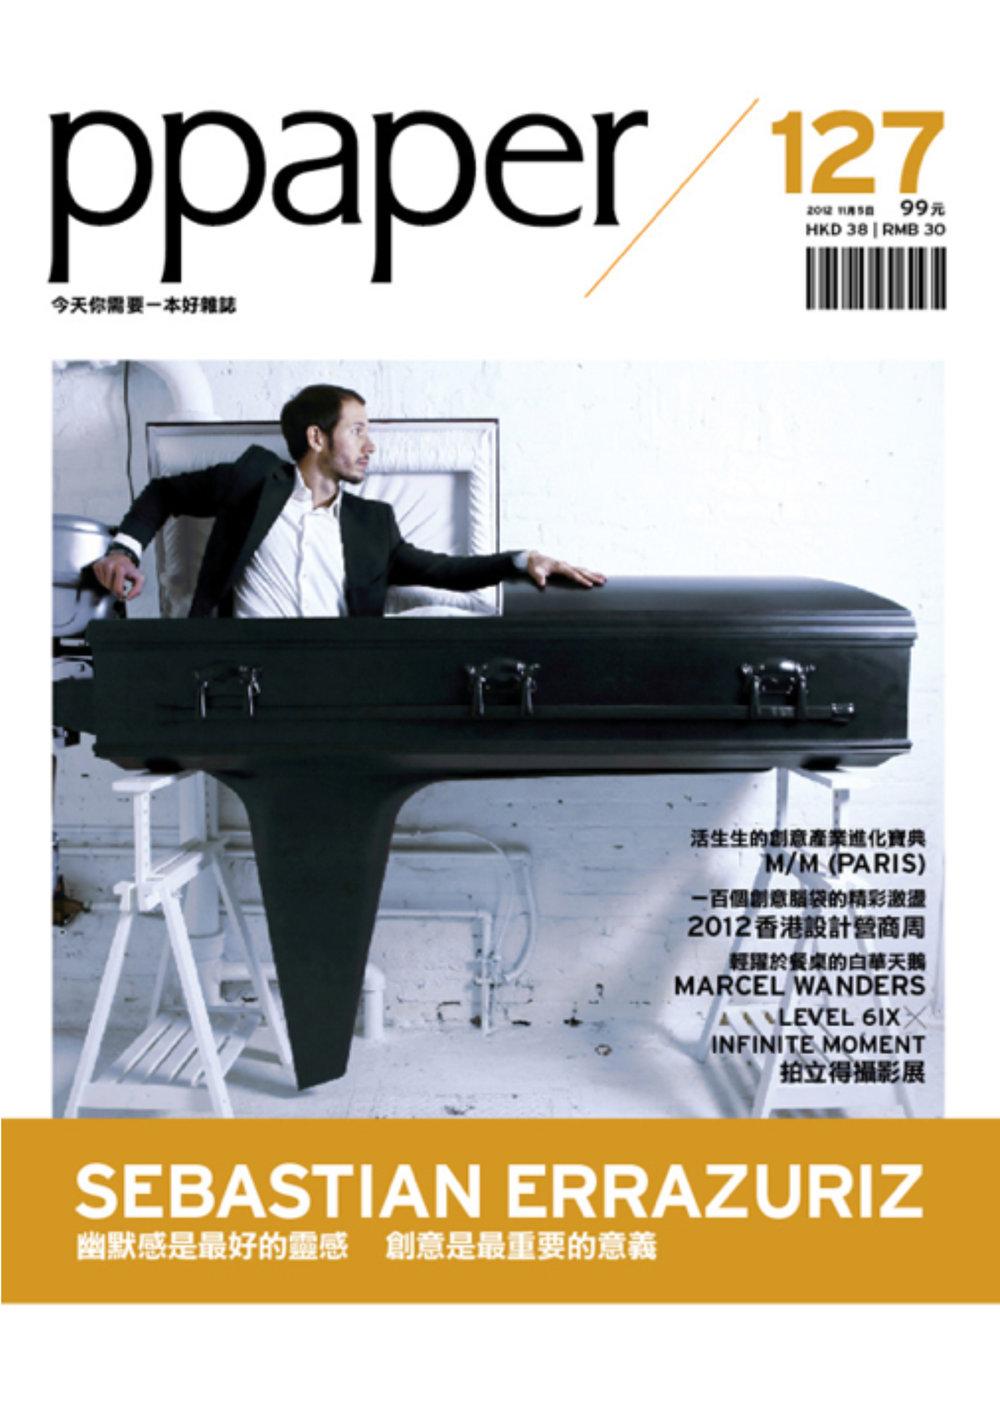 ppaper magazine 2011.jpg